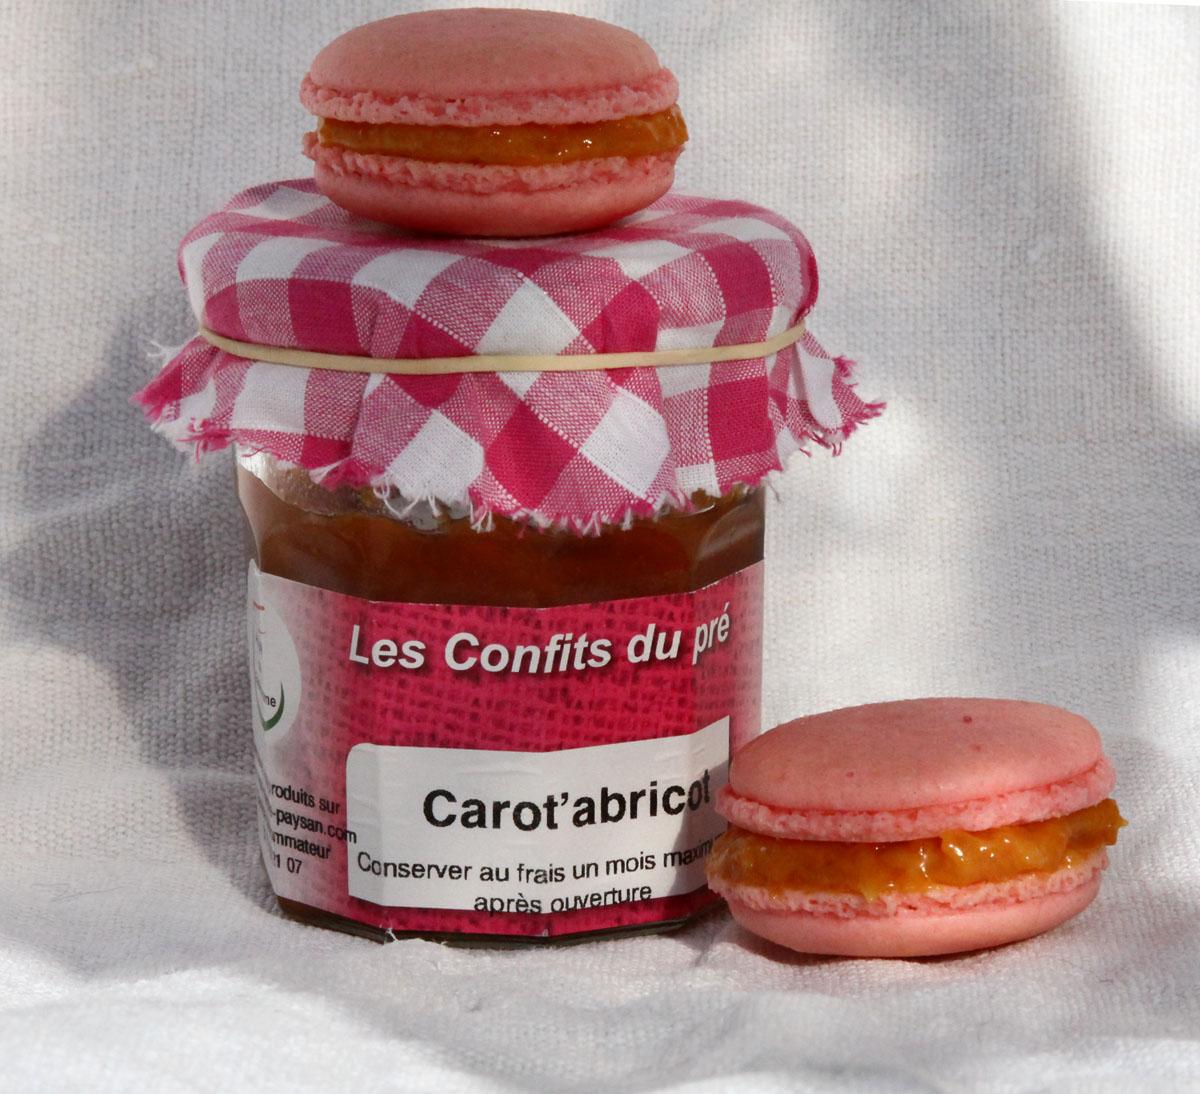 maca carotabricot1a